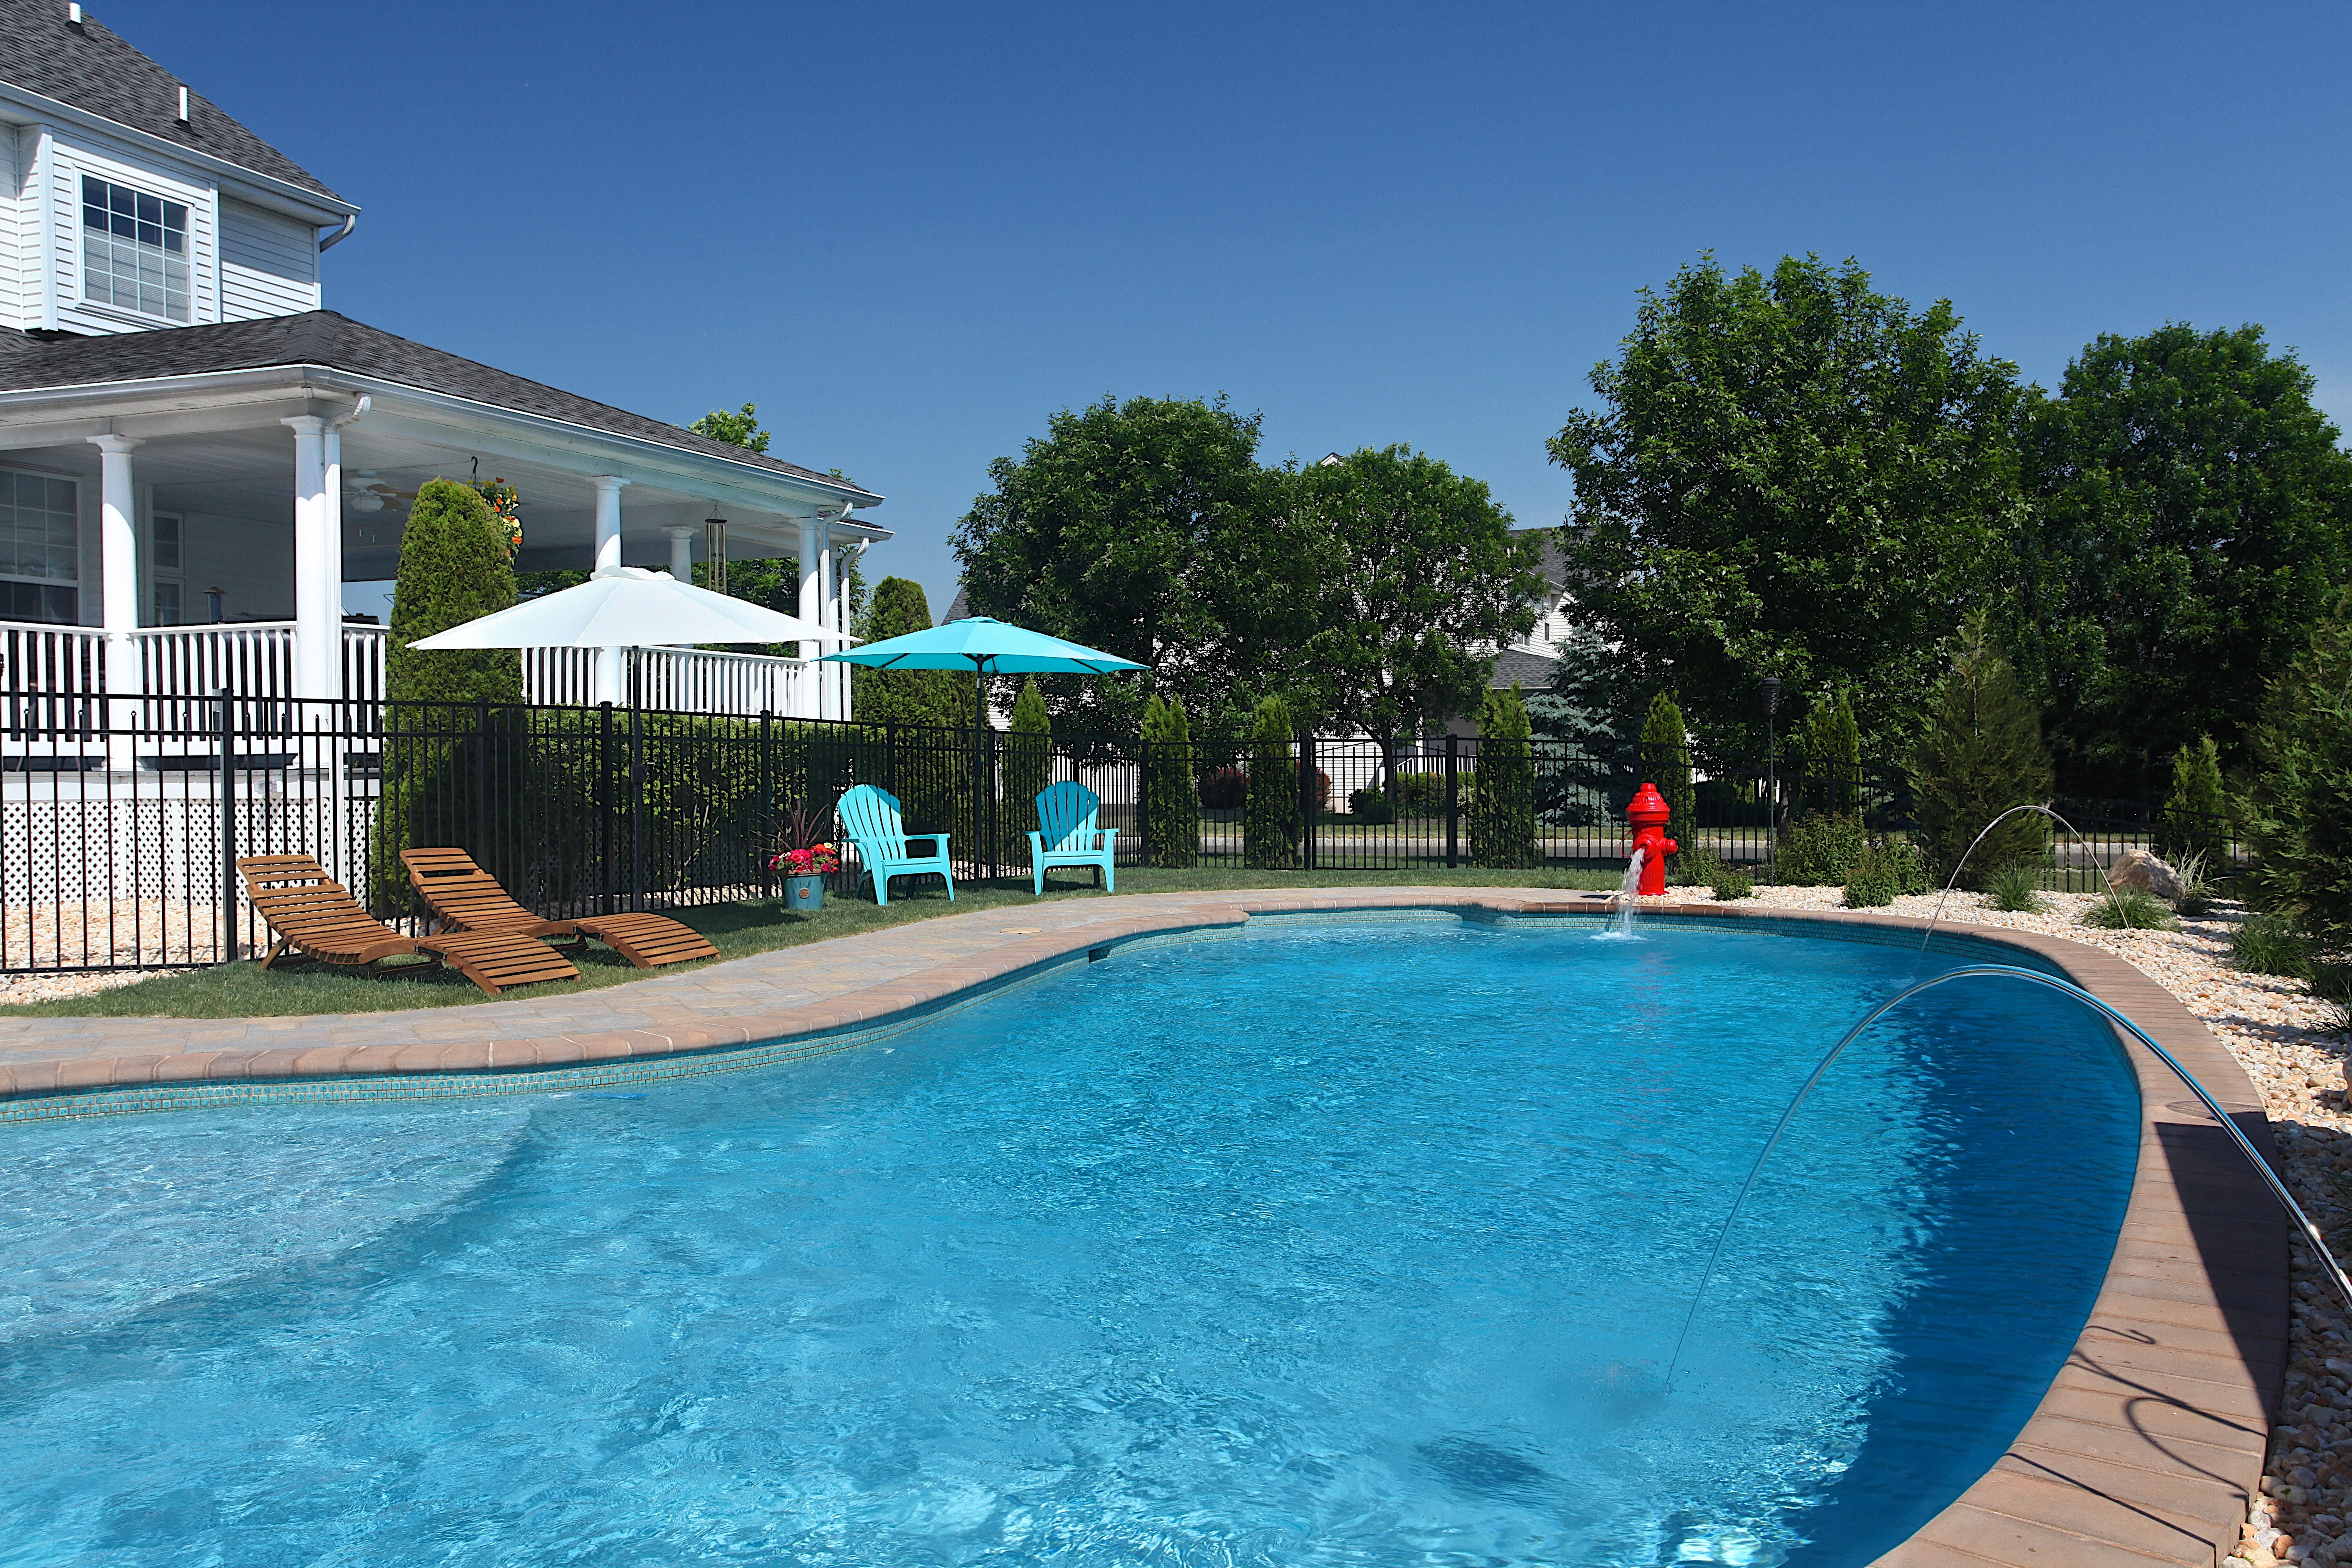 gunite pool greenview designs llc house home magazine - Gunite Pool Design Ideas